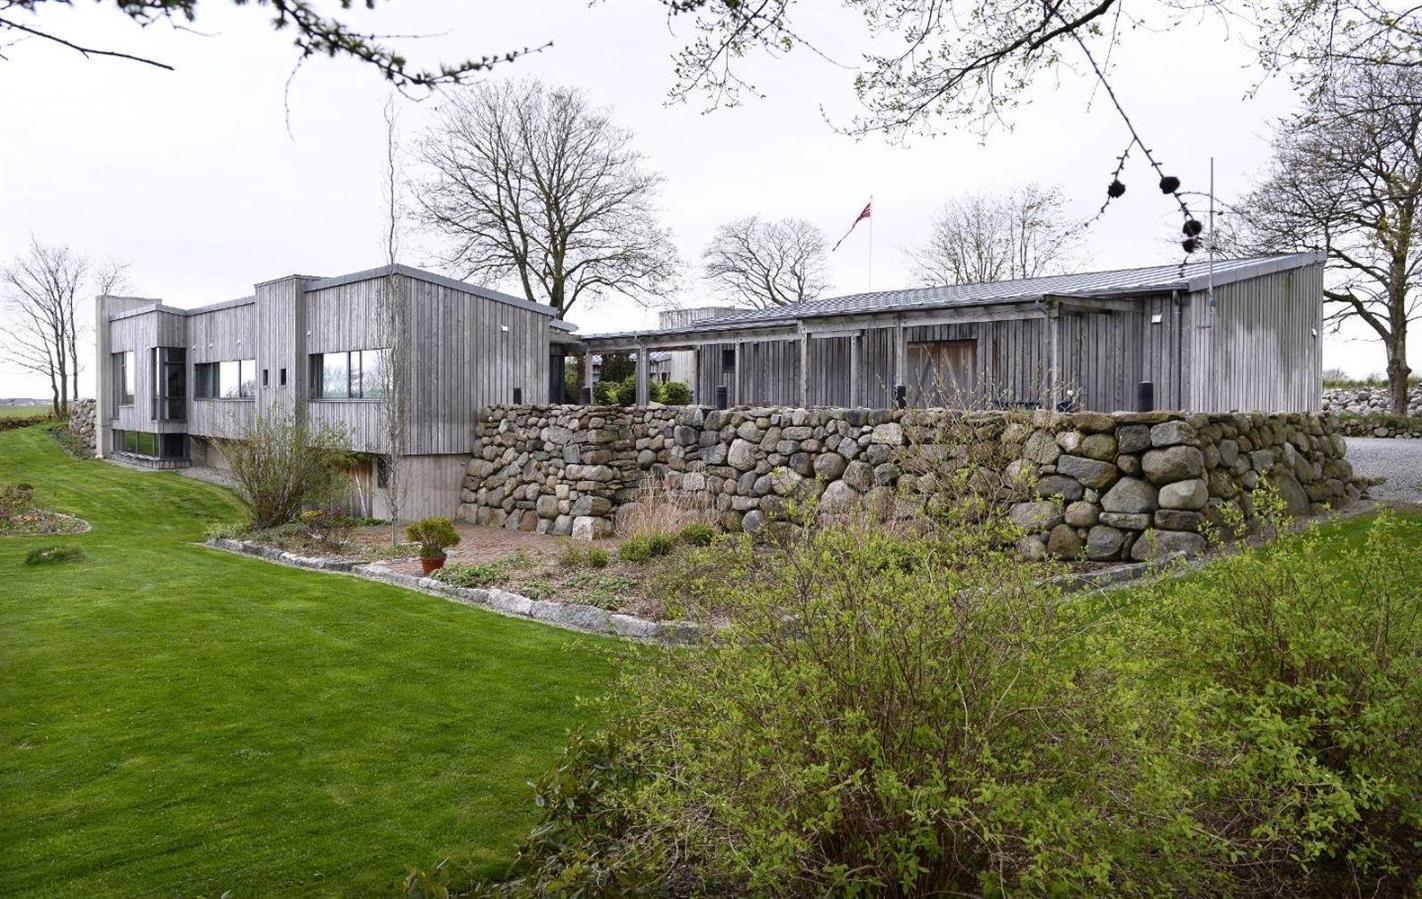 Funkies hus og naturstein mur